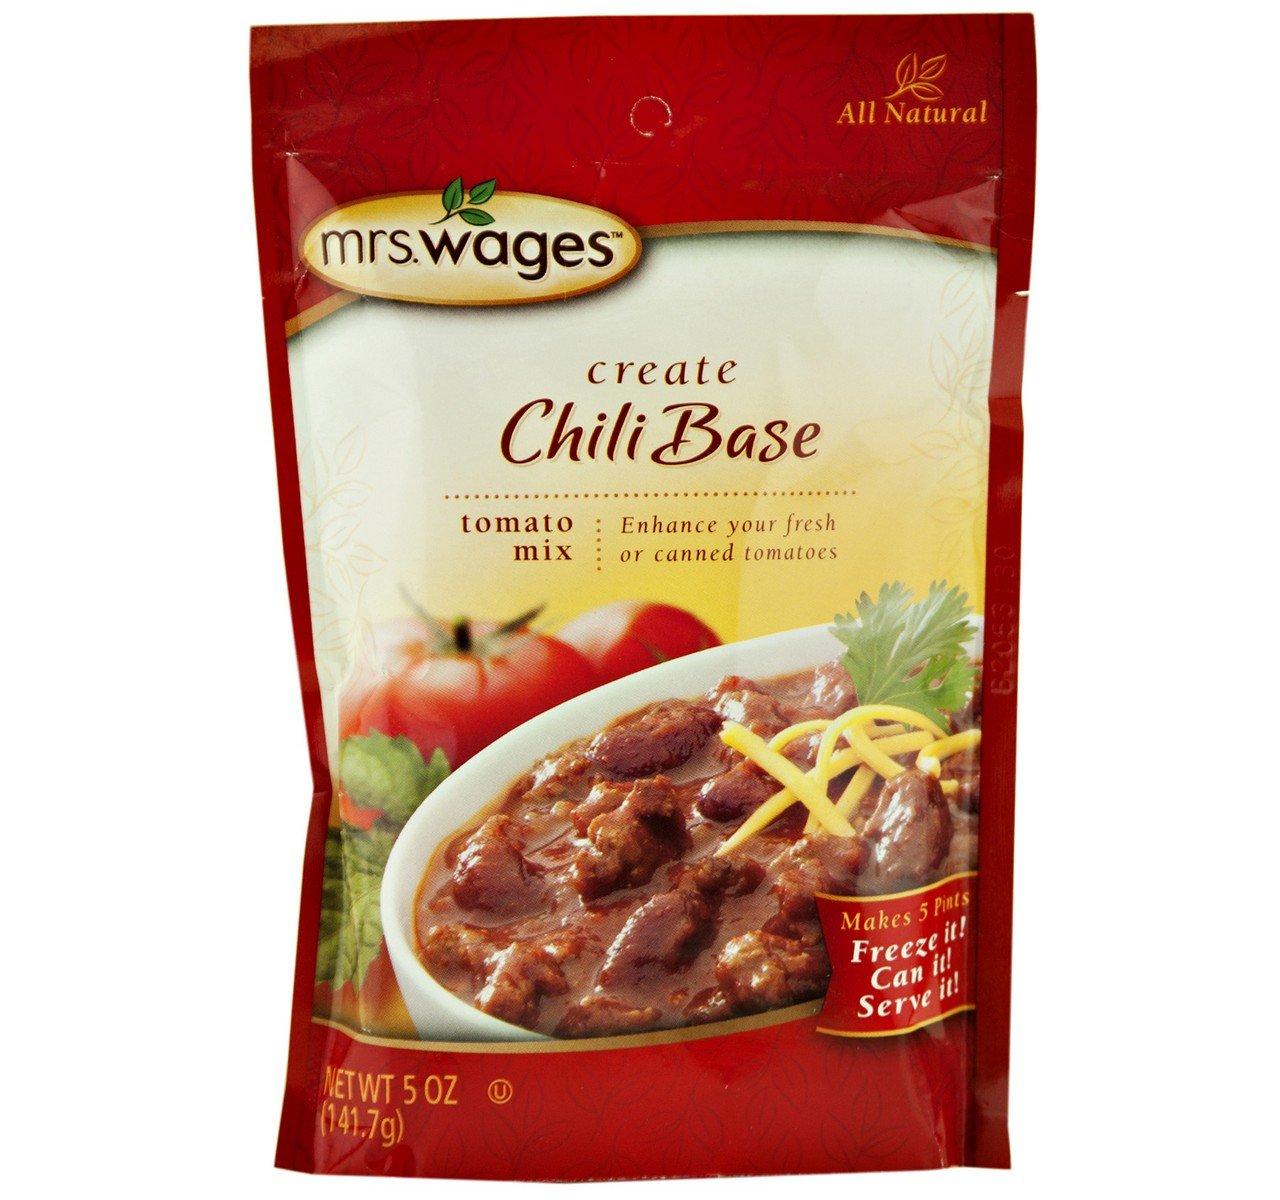 Mrs. Wages Chili Base Tomato Seasoning Mix, 5 Oz. Pouch (Pack of 2)